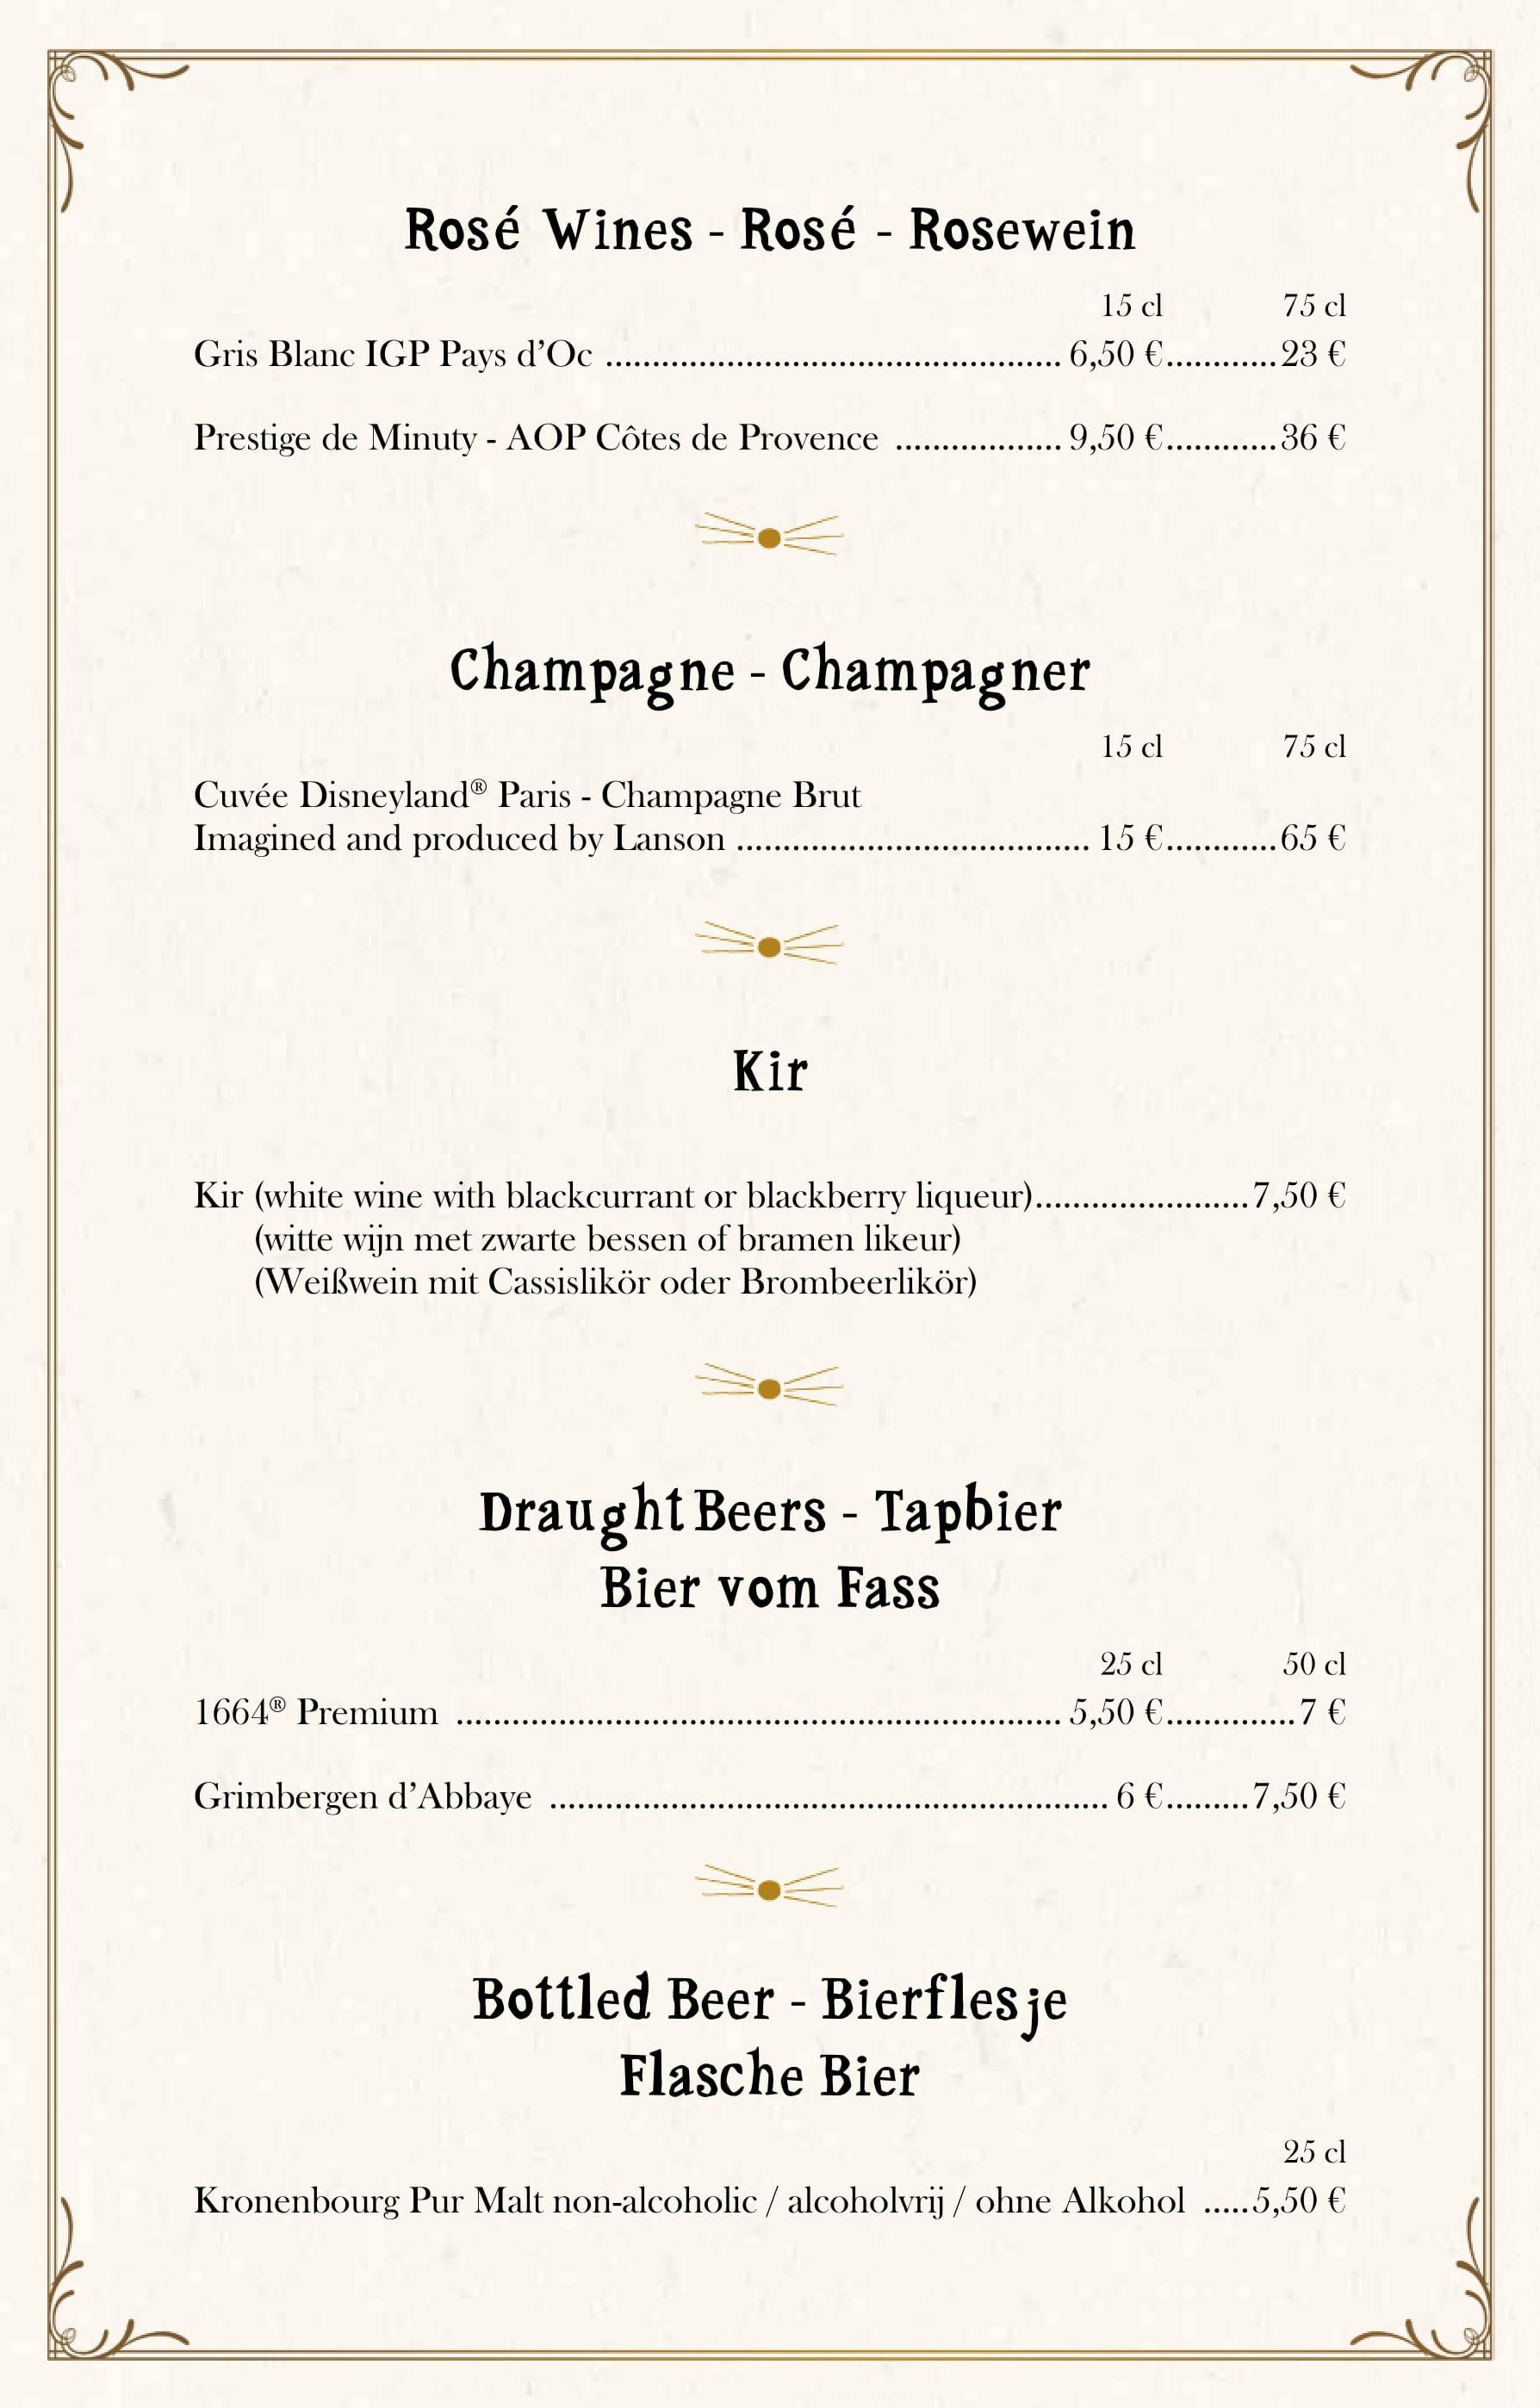 Bistrot Chez Rémy Wine List at Disneyland Paris